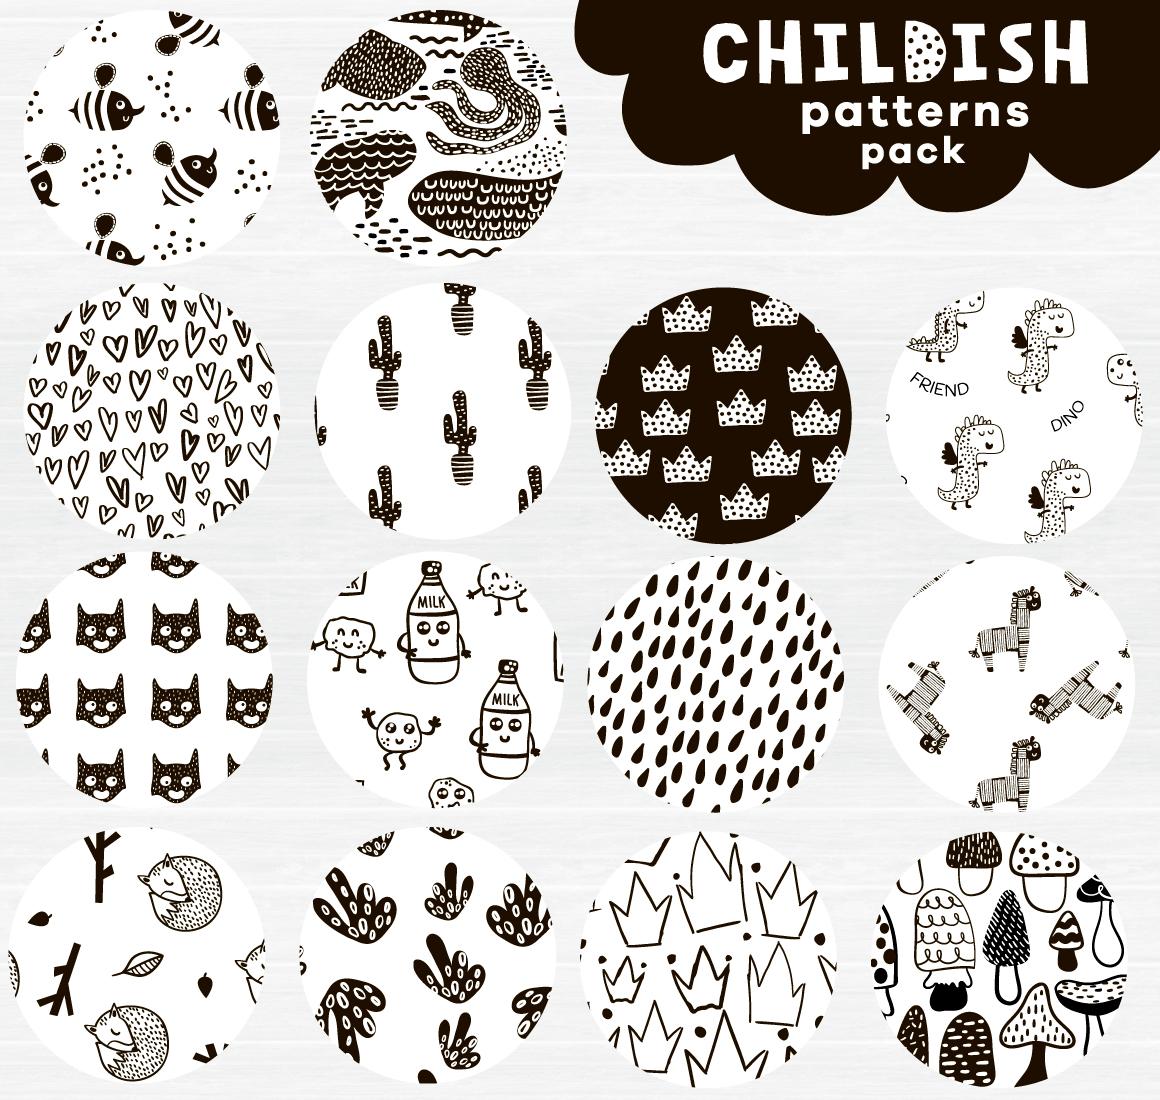 Childish patterns pack example image 3